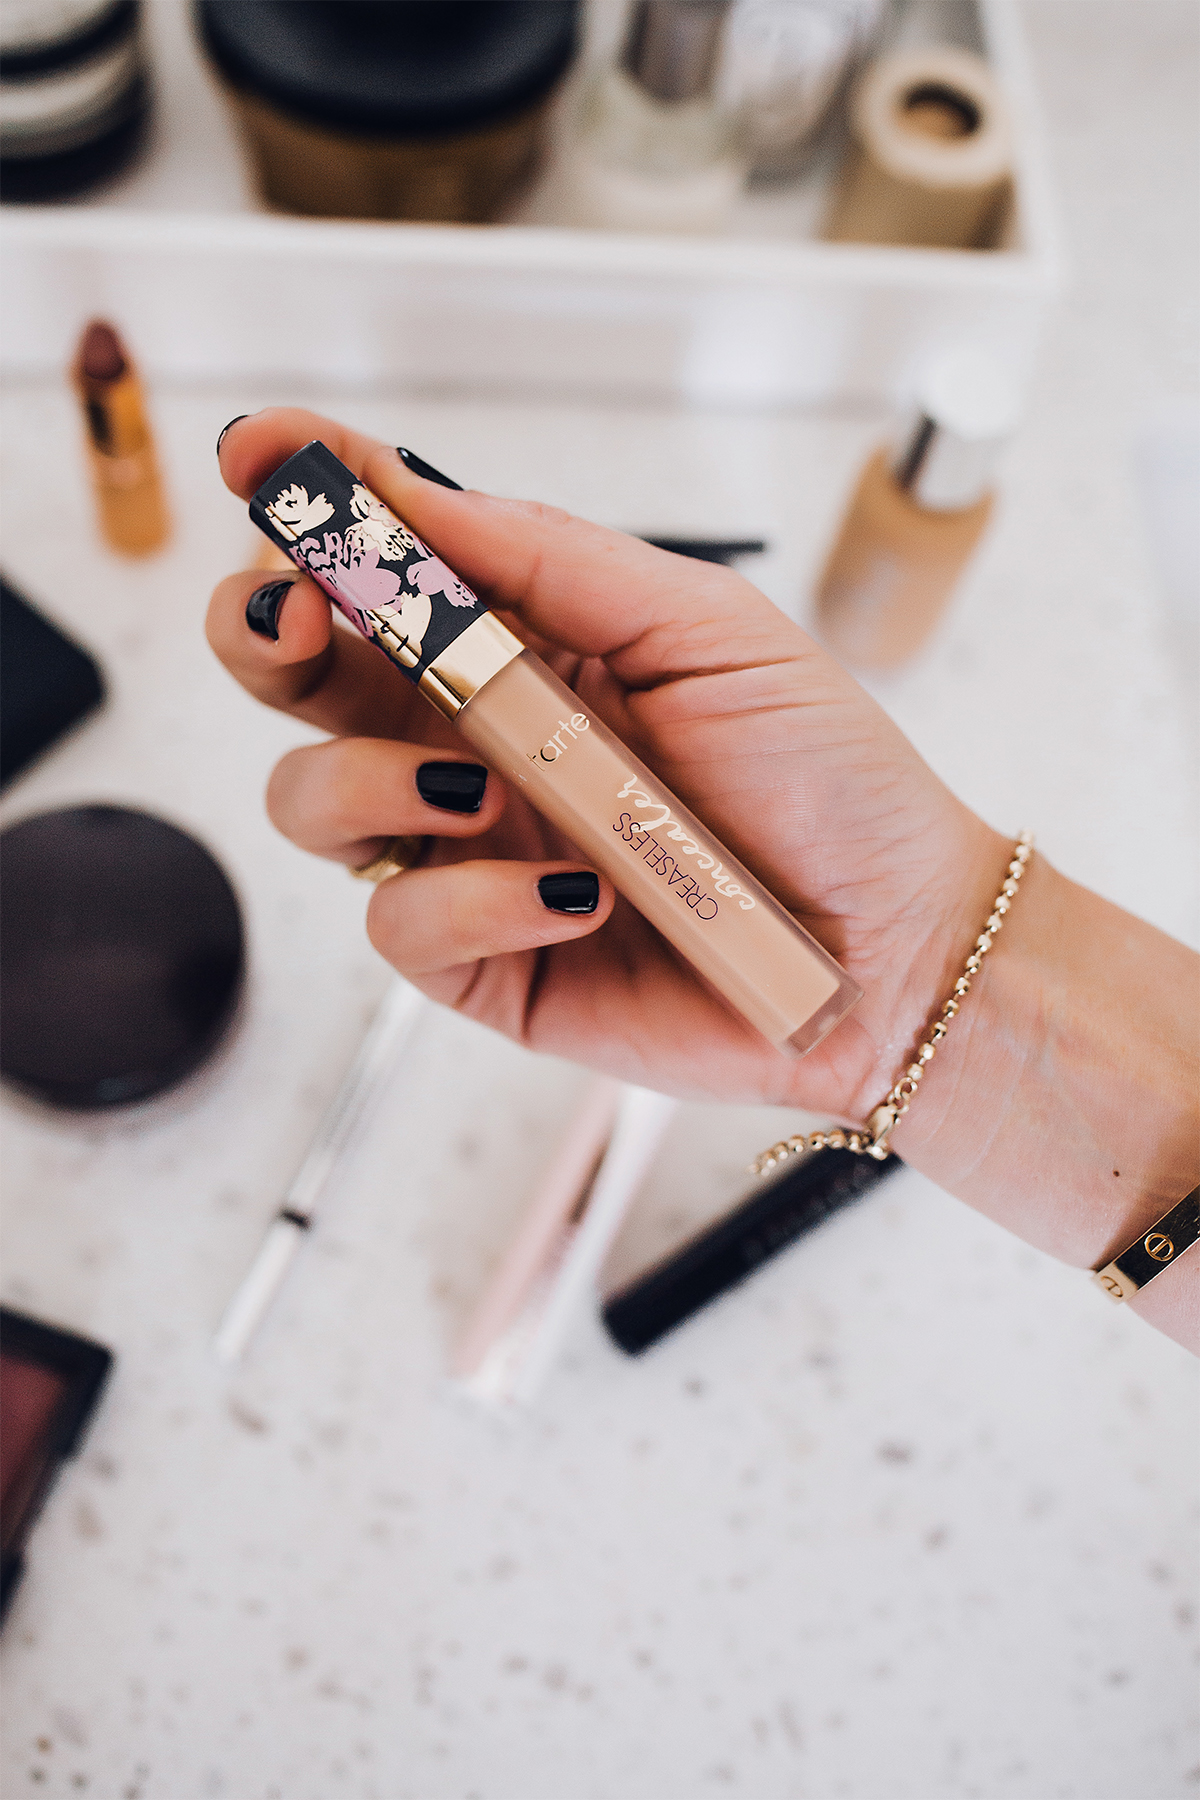 Fashion Jackson Daily Makeup Beauty Routine Tarte Creaseless Concealer